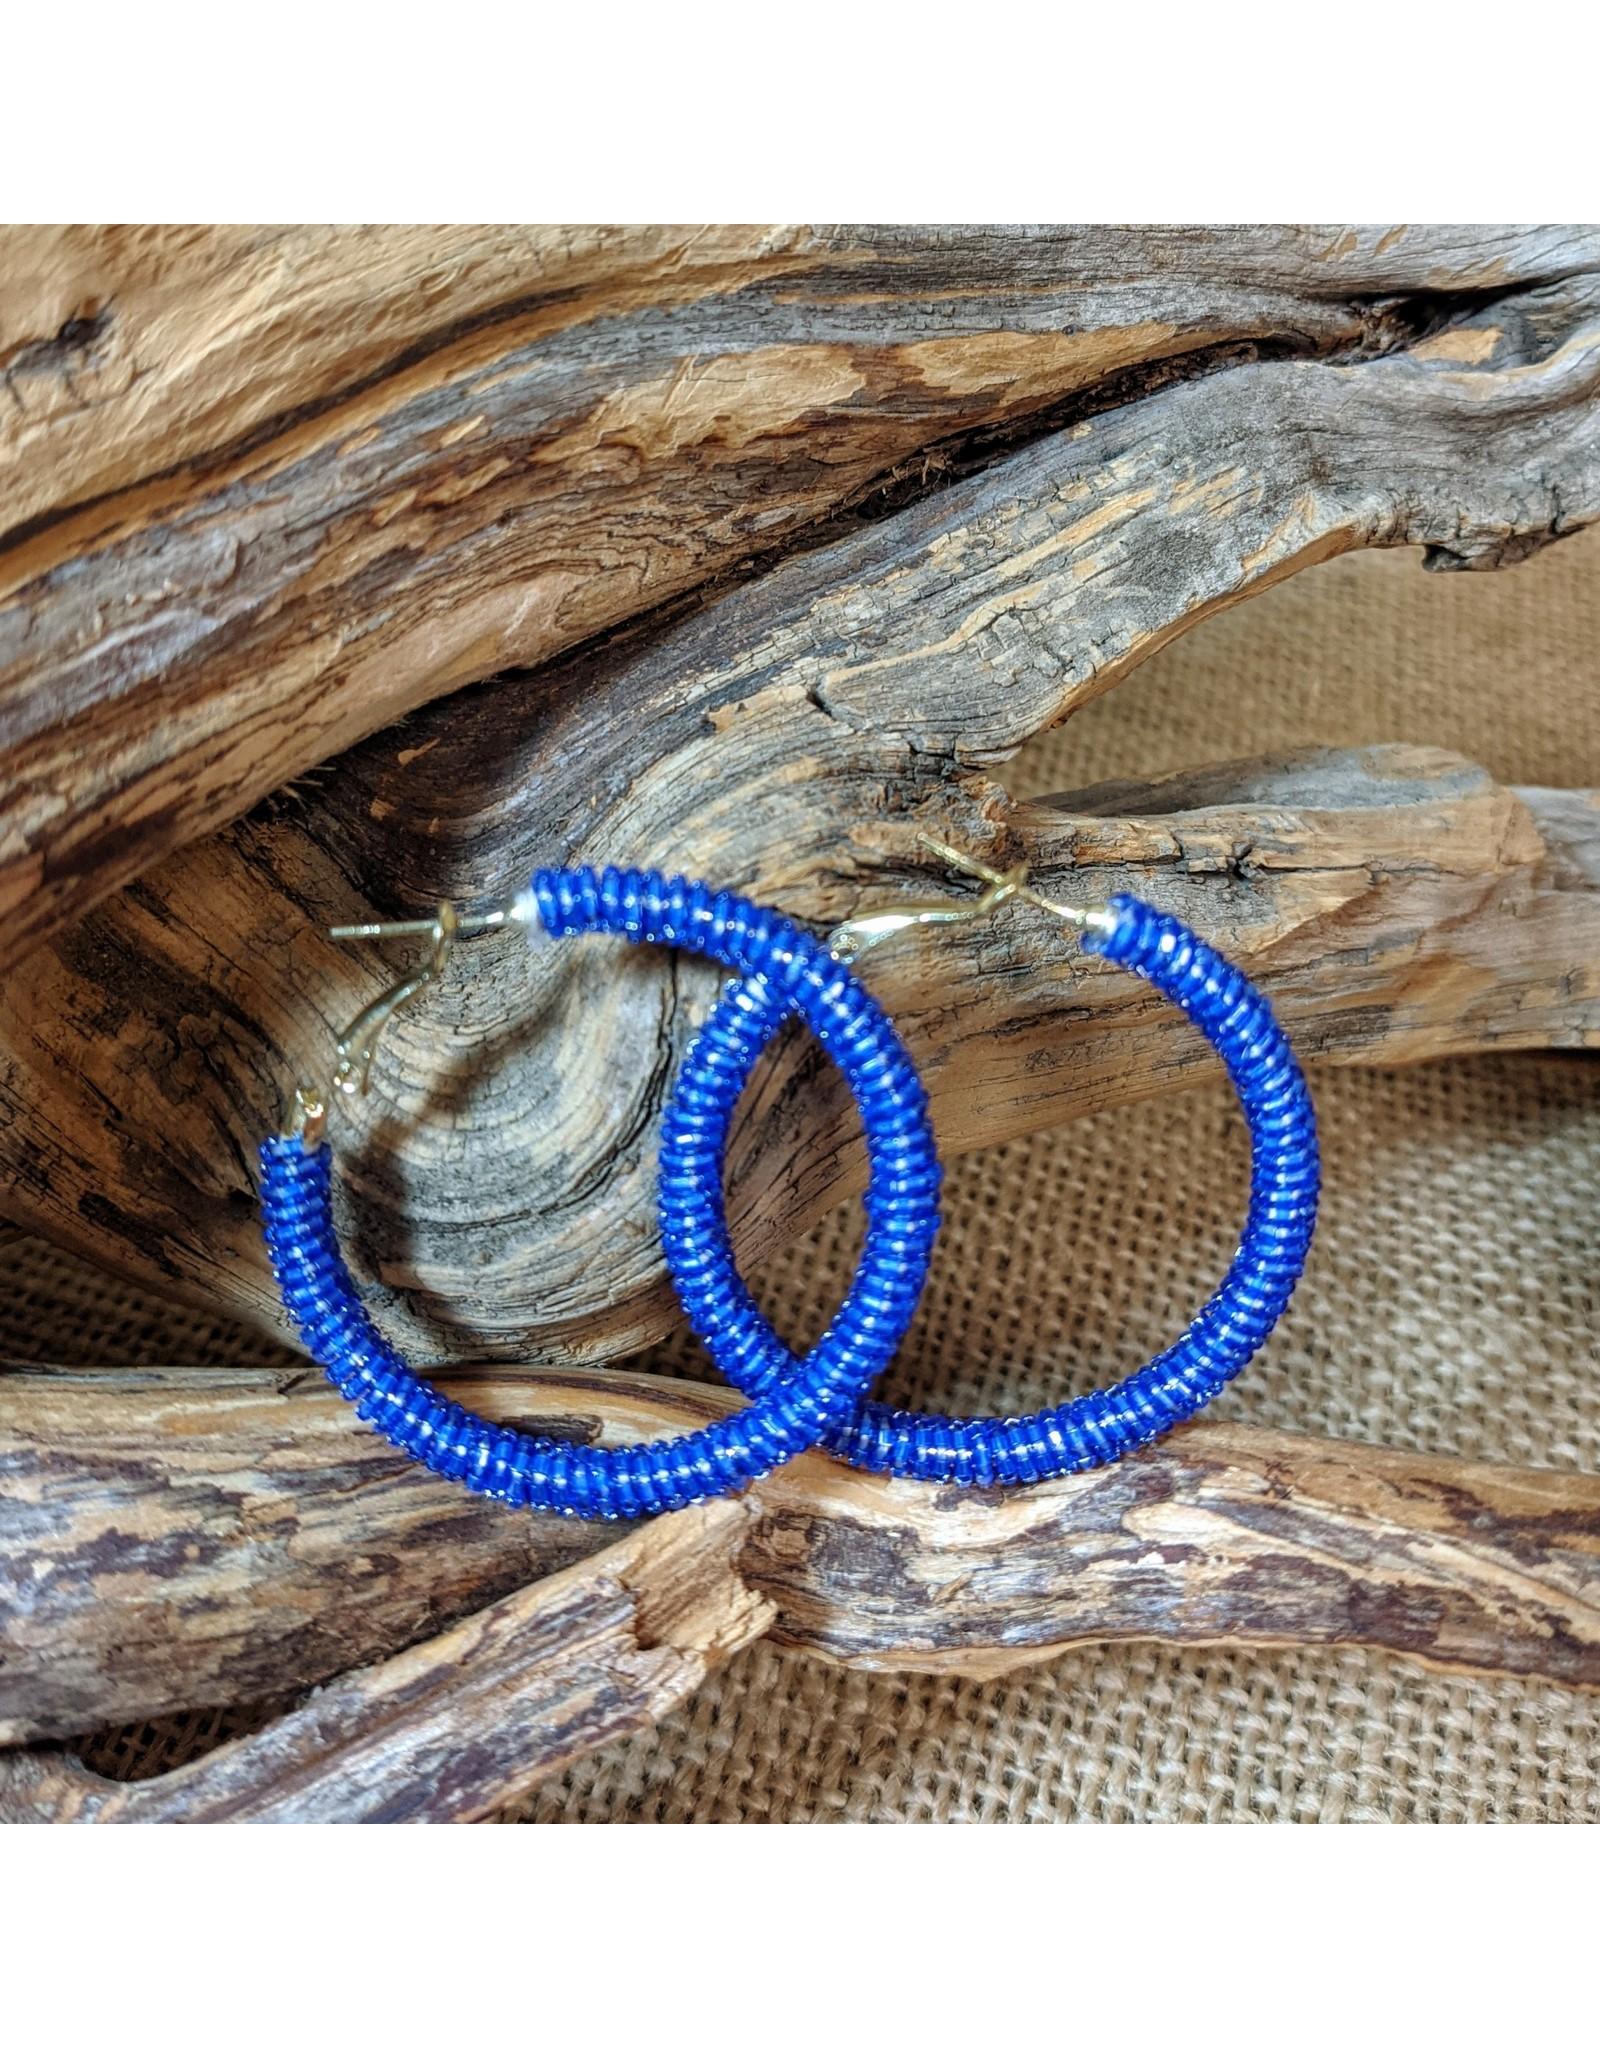 Ten Thousand Villages Blue Glass Bead Hoop Earrings, India